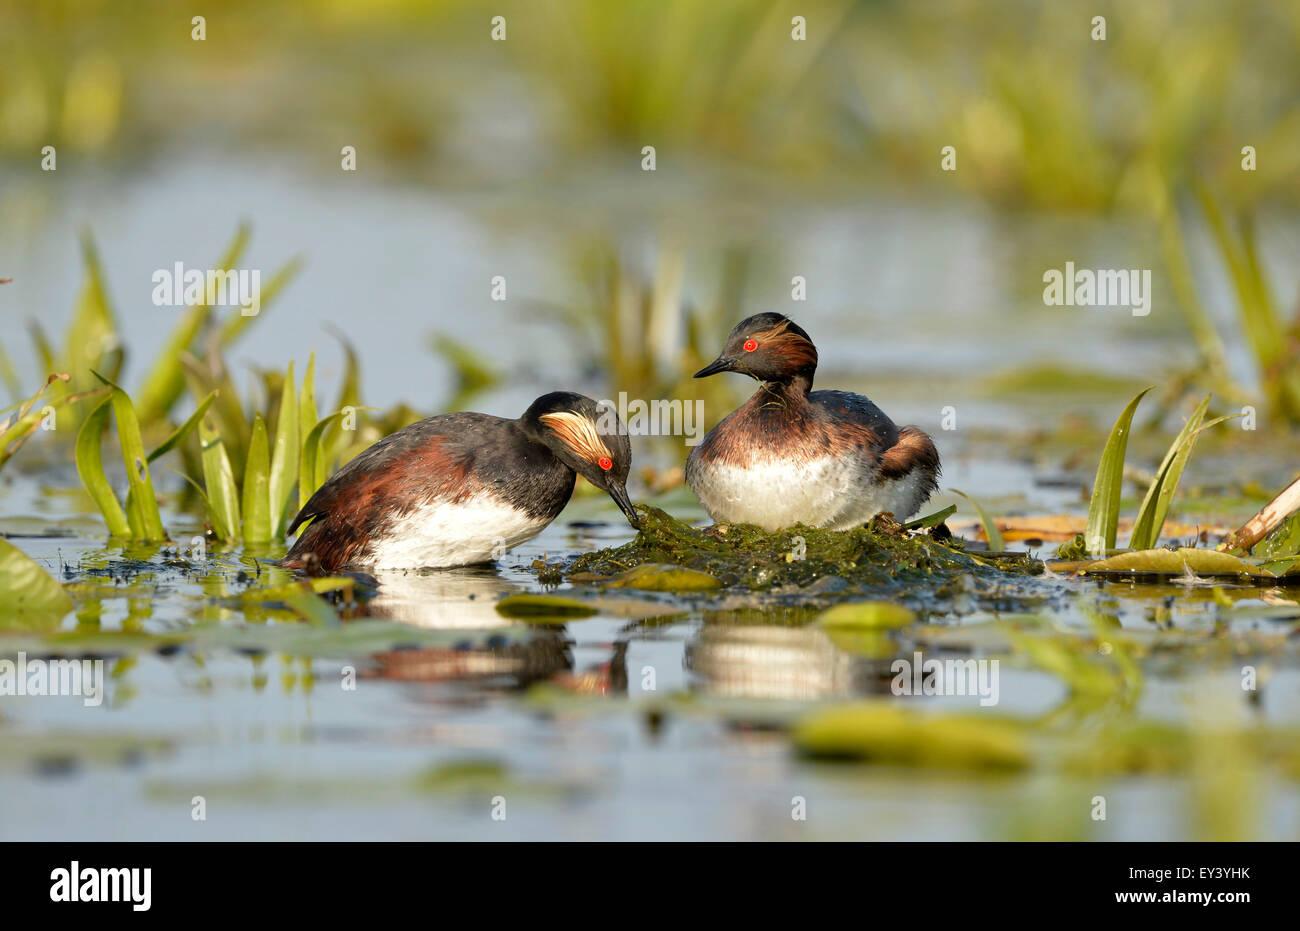 Black-necked Grebe (Podiceps nigricollis) pair at nest, Danube delta, Romania, May - Stock Image